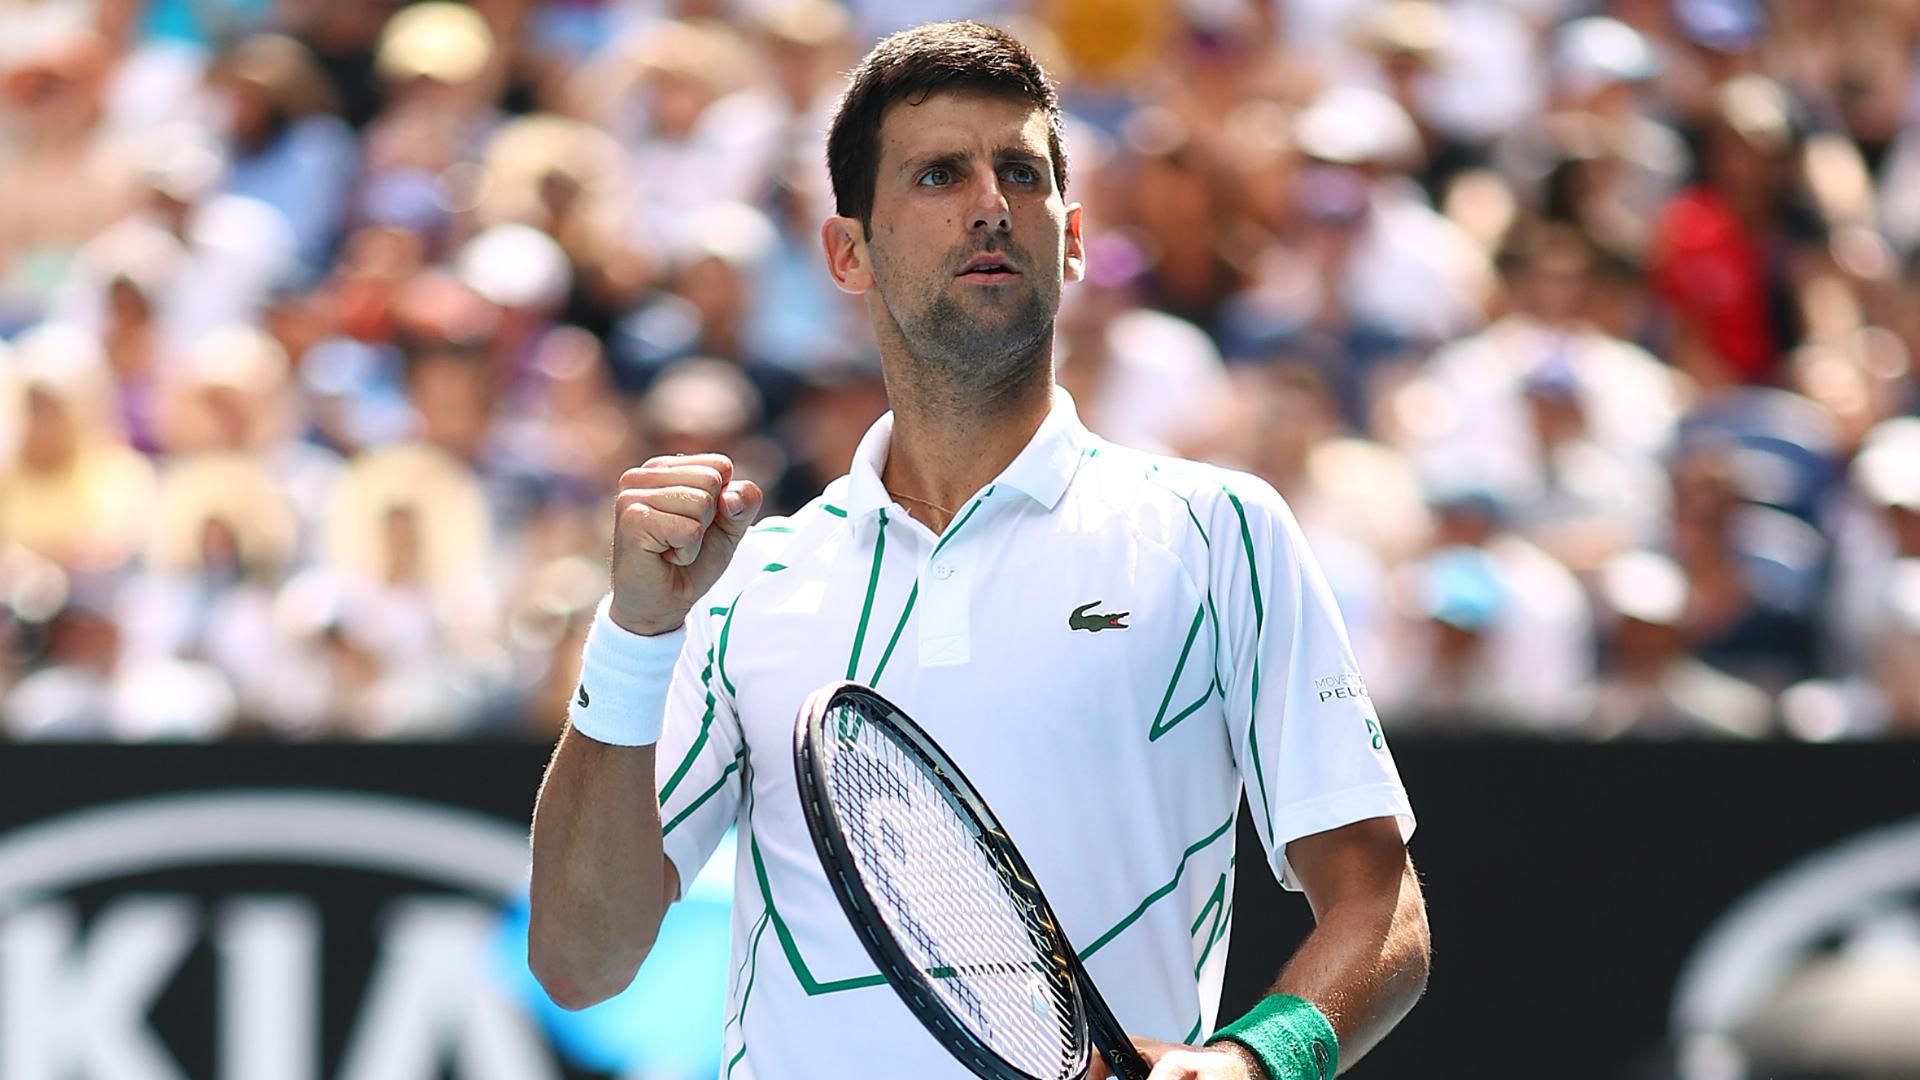 Australian Open 2020: Dominant Djokovic powers through to quarter-finals